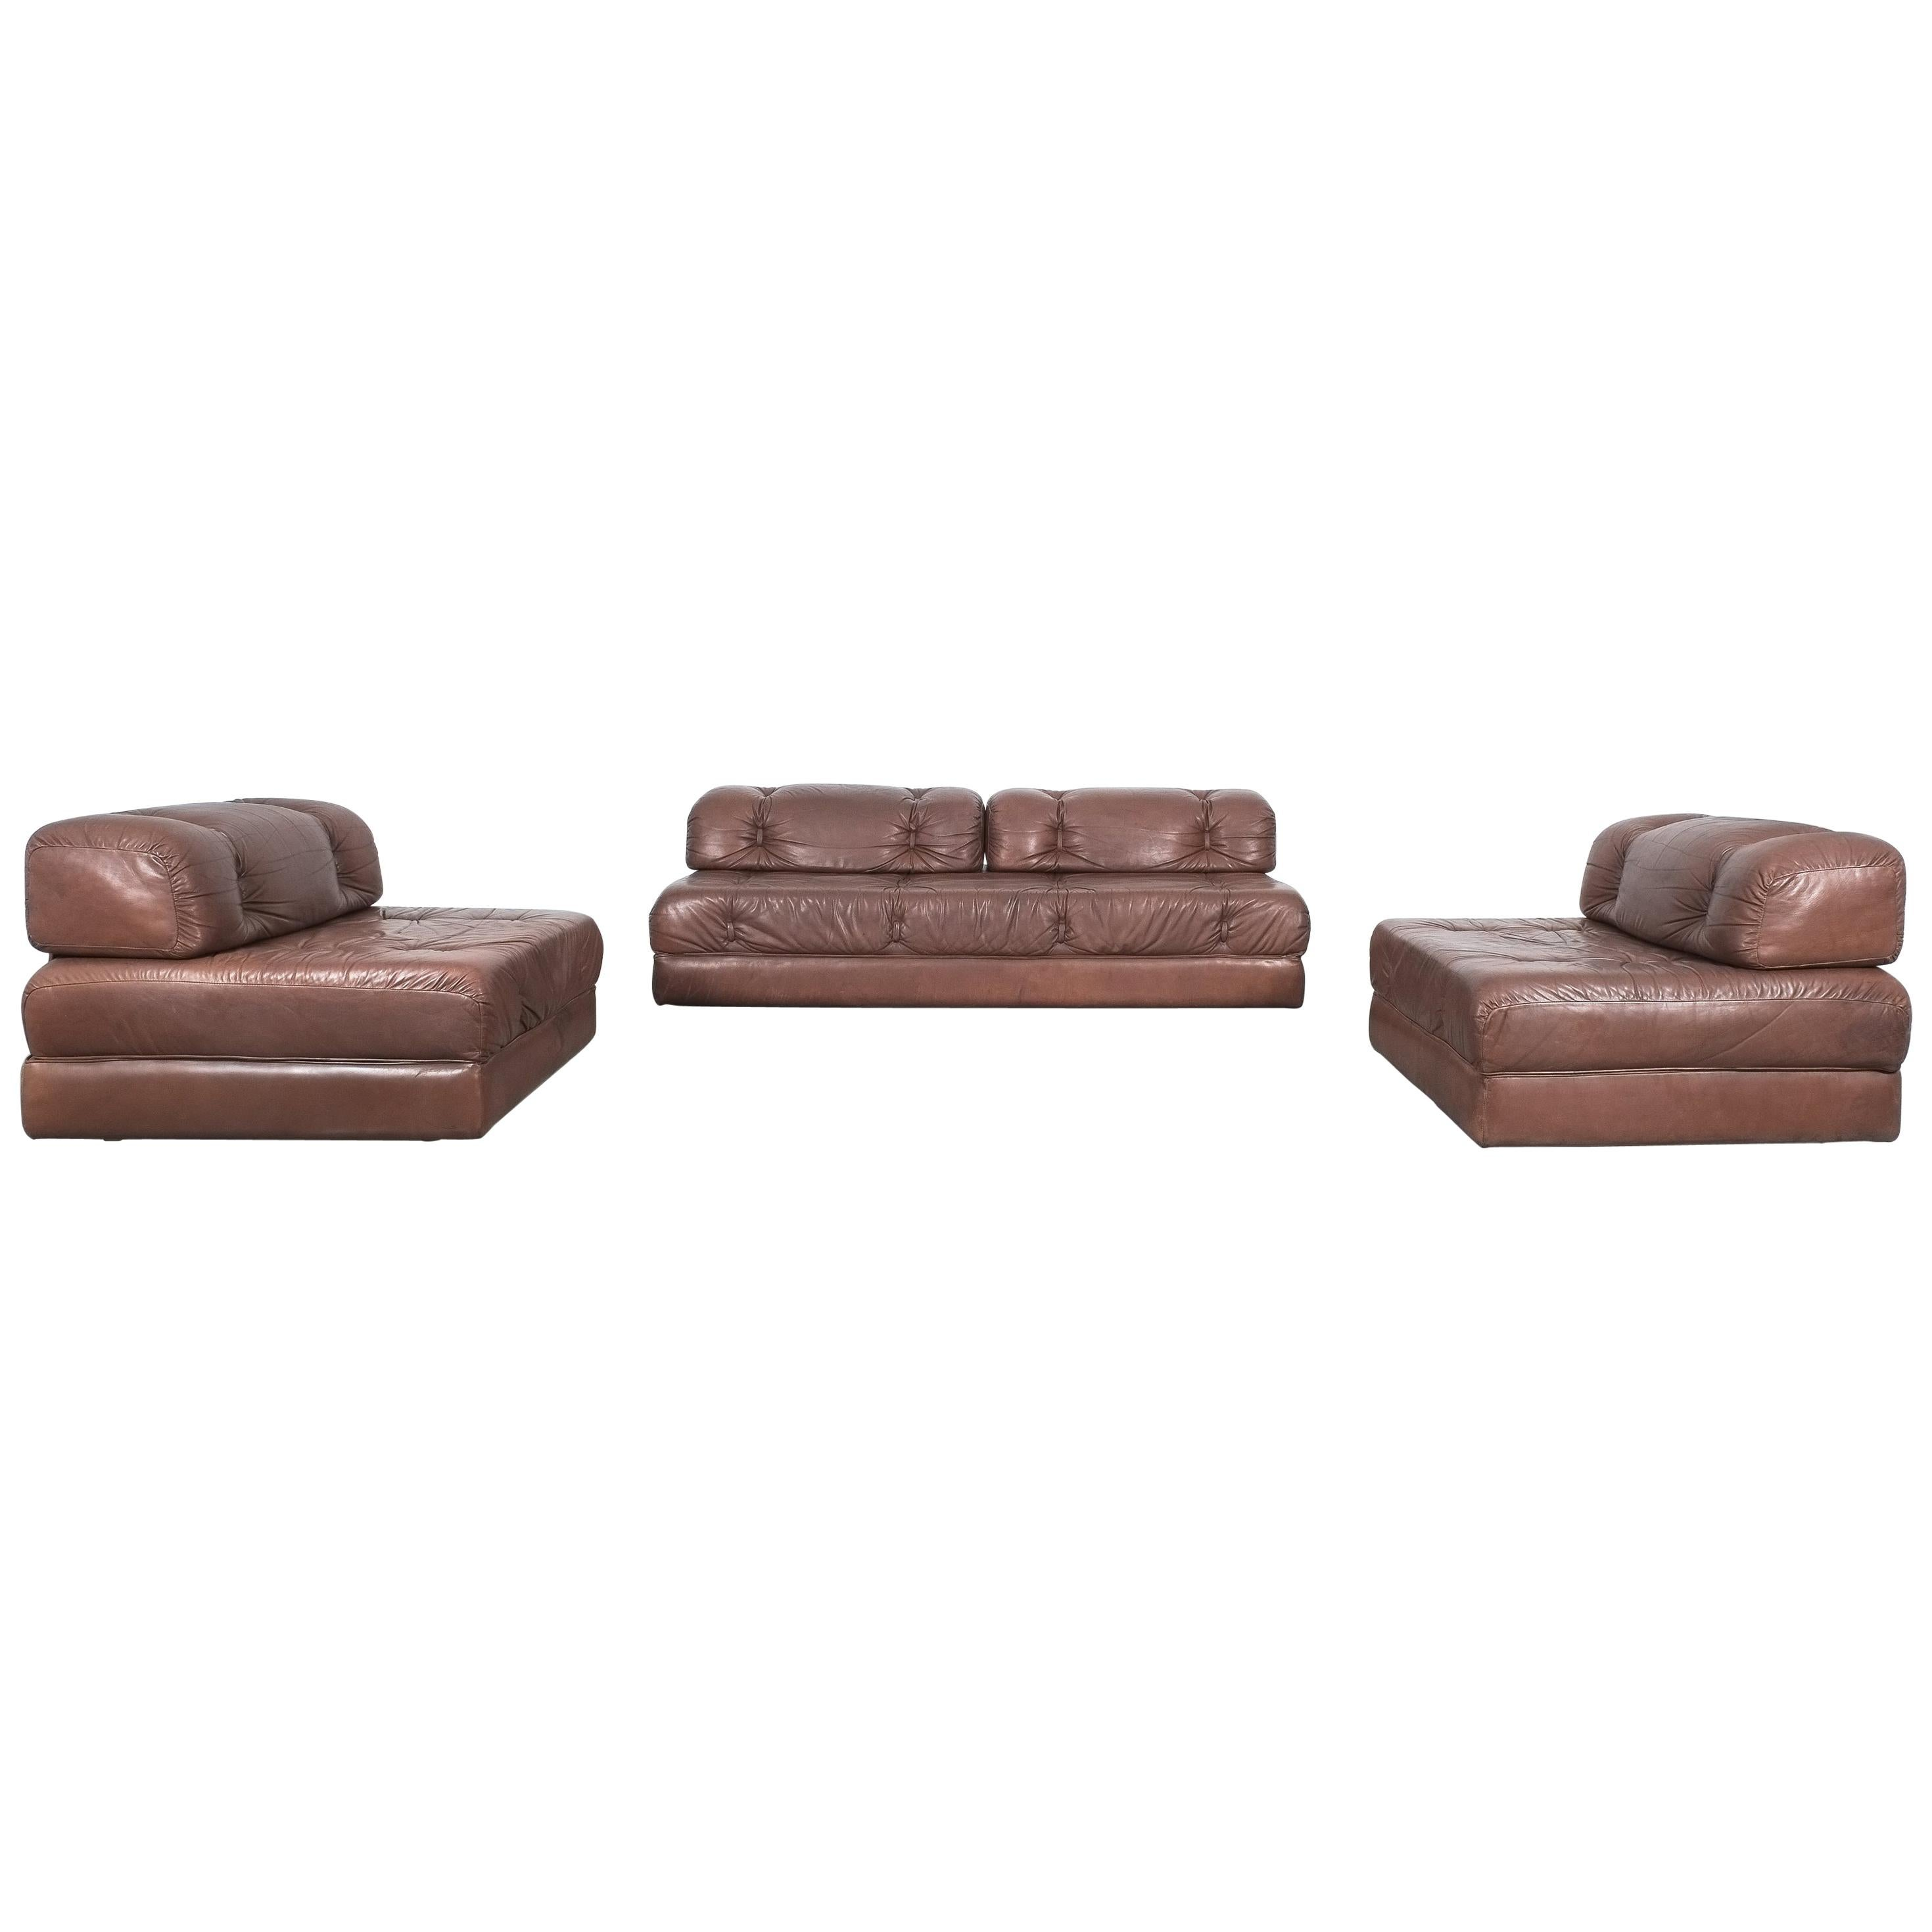 Wittmann Atrium Sofa and Two Chairs Brown Leather, Austria